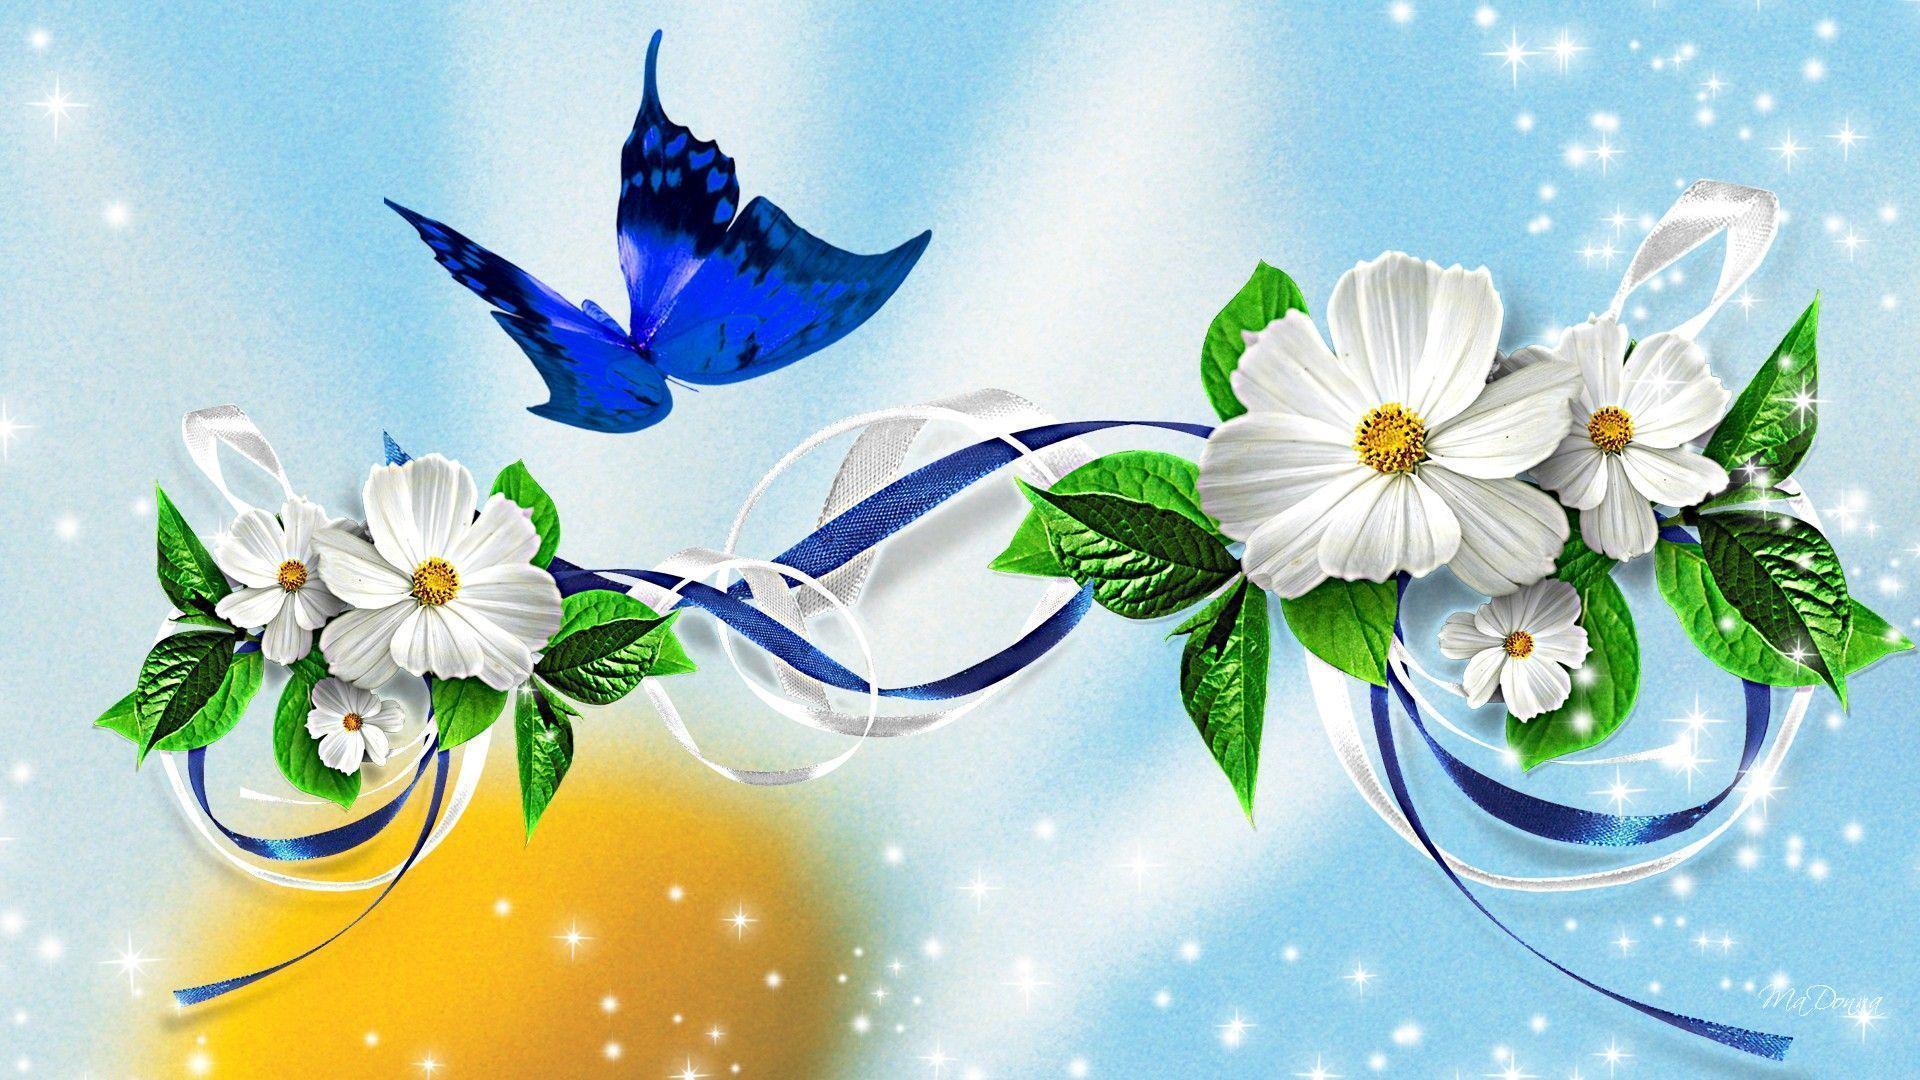 Wallpaper Download The Free Balloons Flowers Butterflies Design